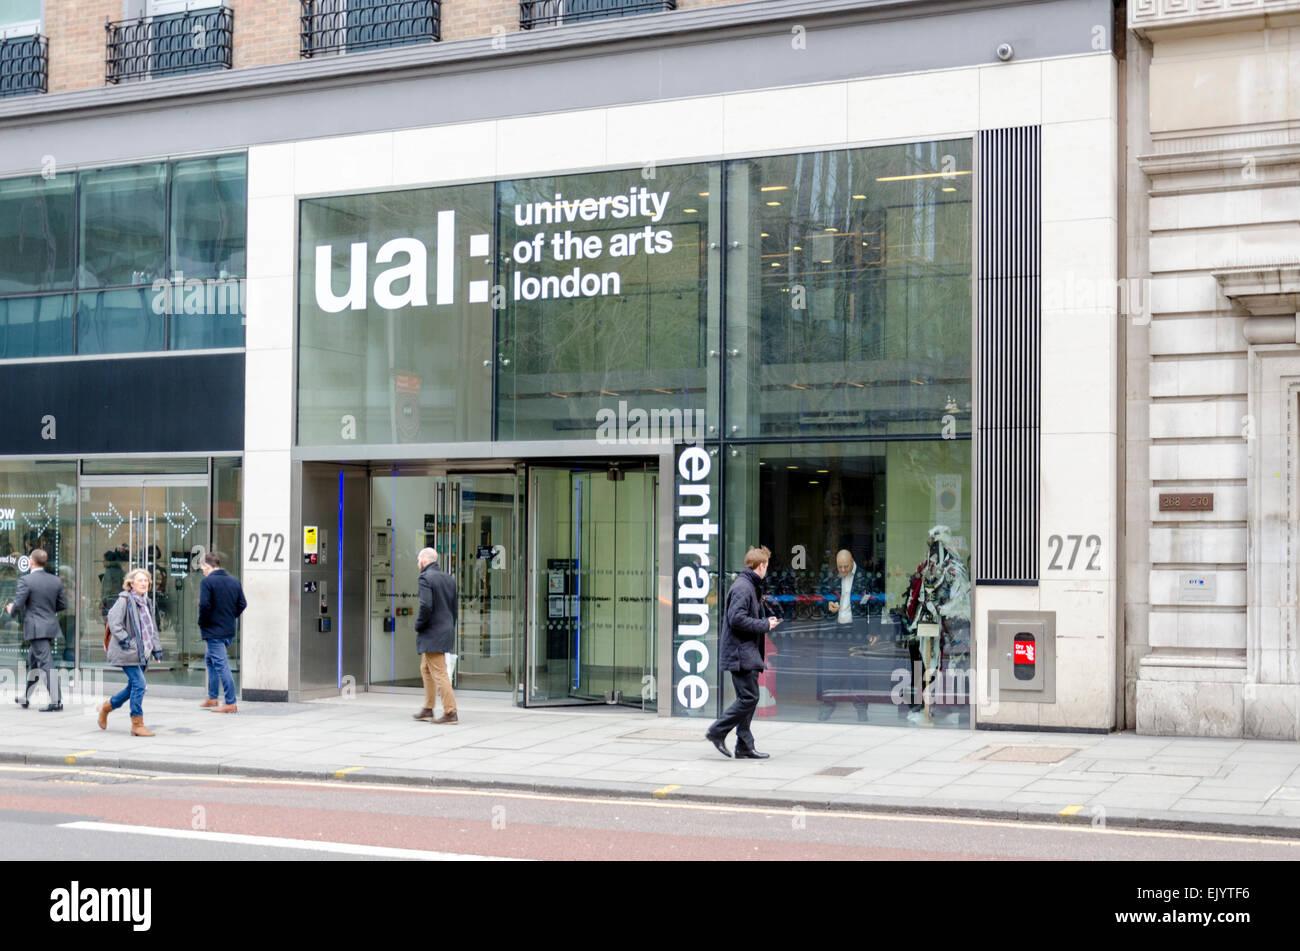 University of the Arts à Londres (UAL), London, UK Photo Stock